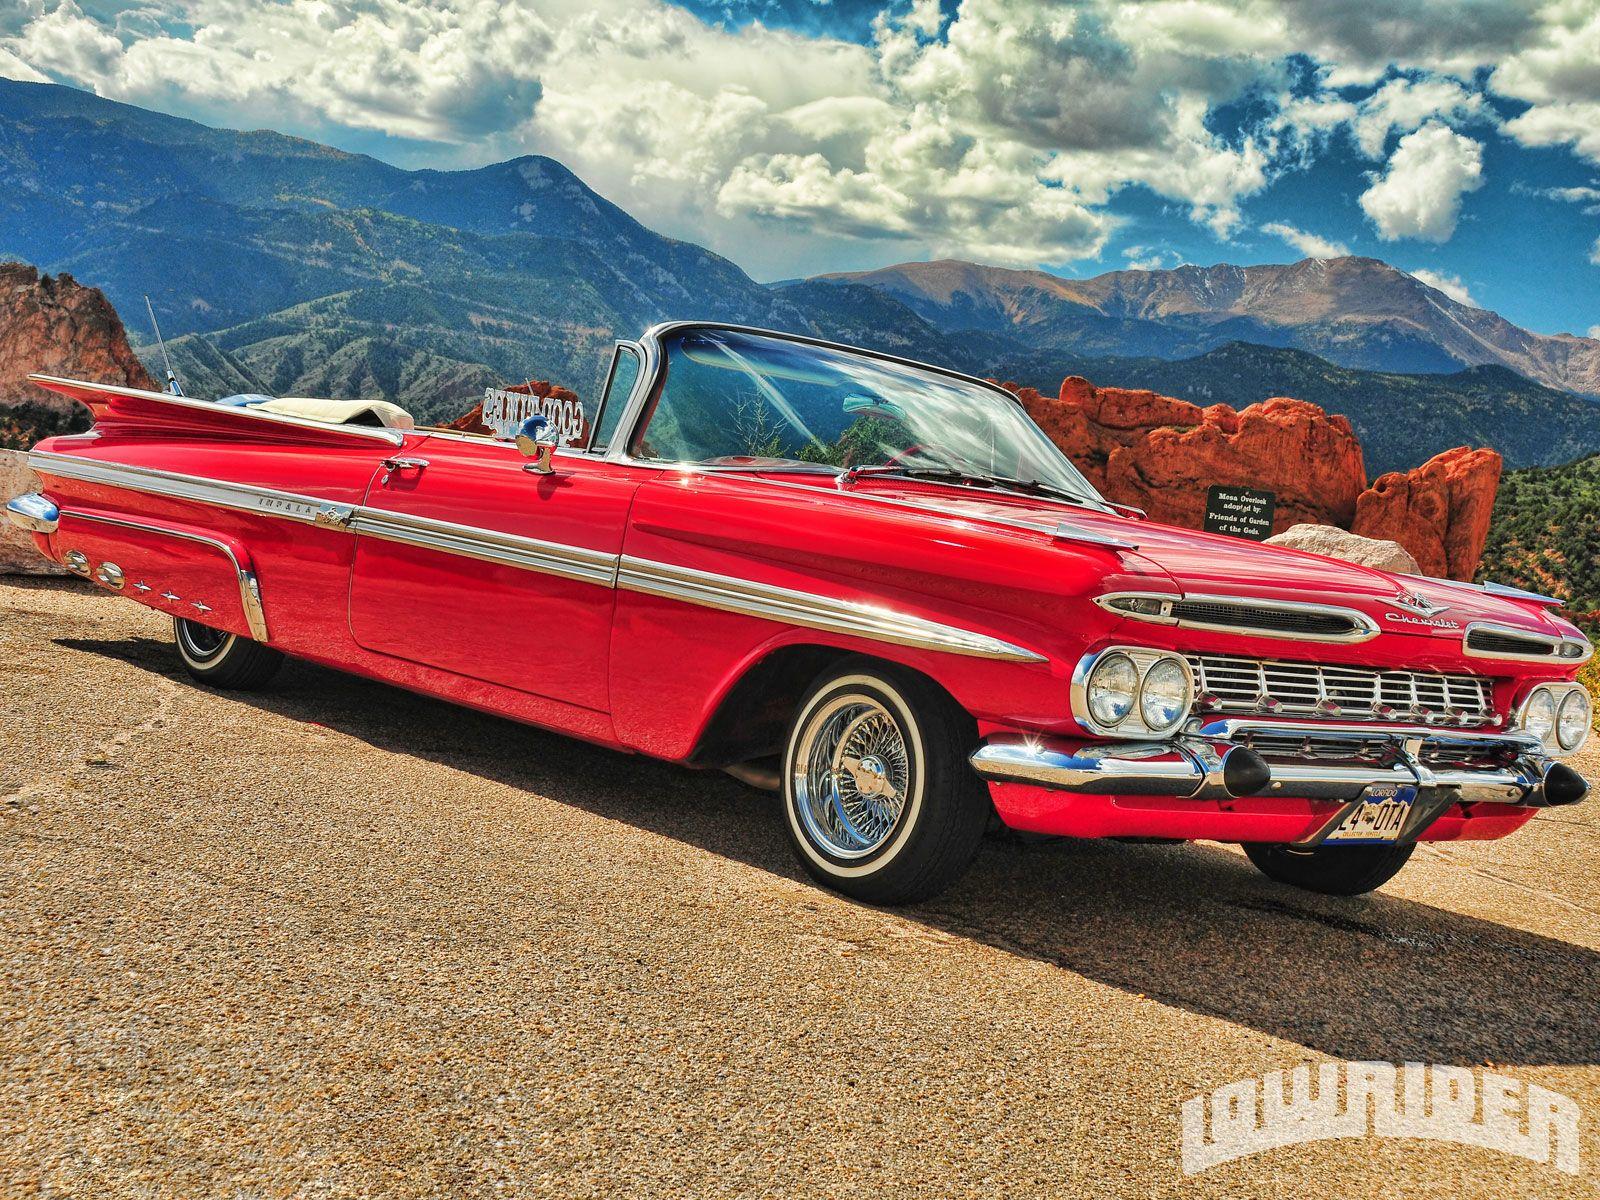 1961 chevrolet impala convertible 1959 chevrolet impala